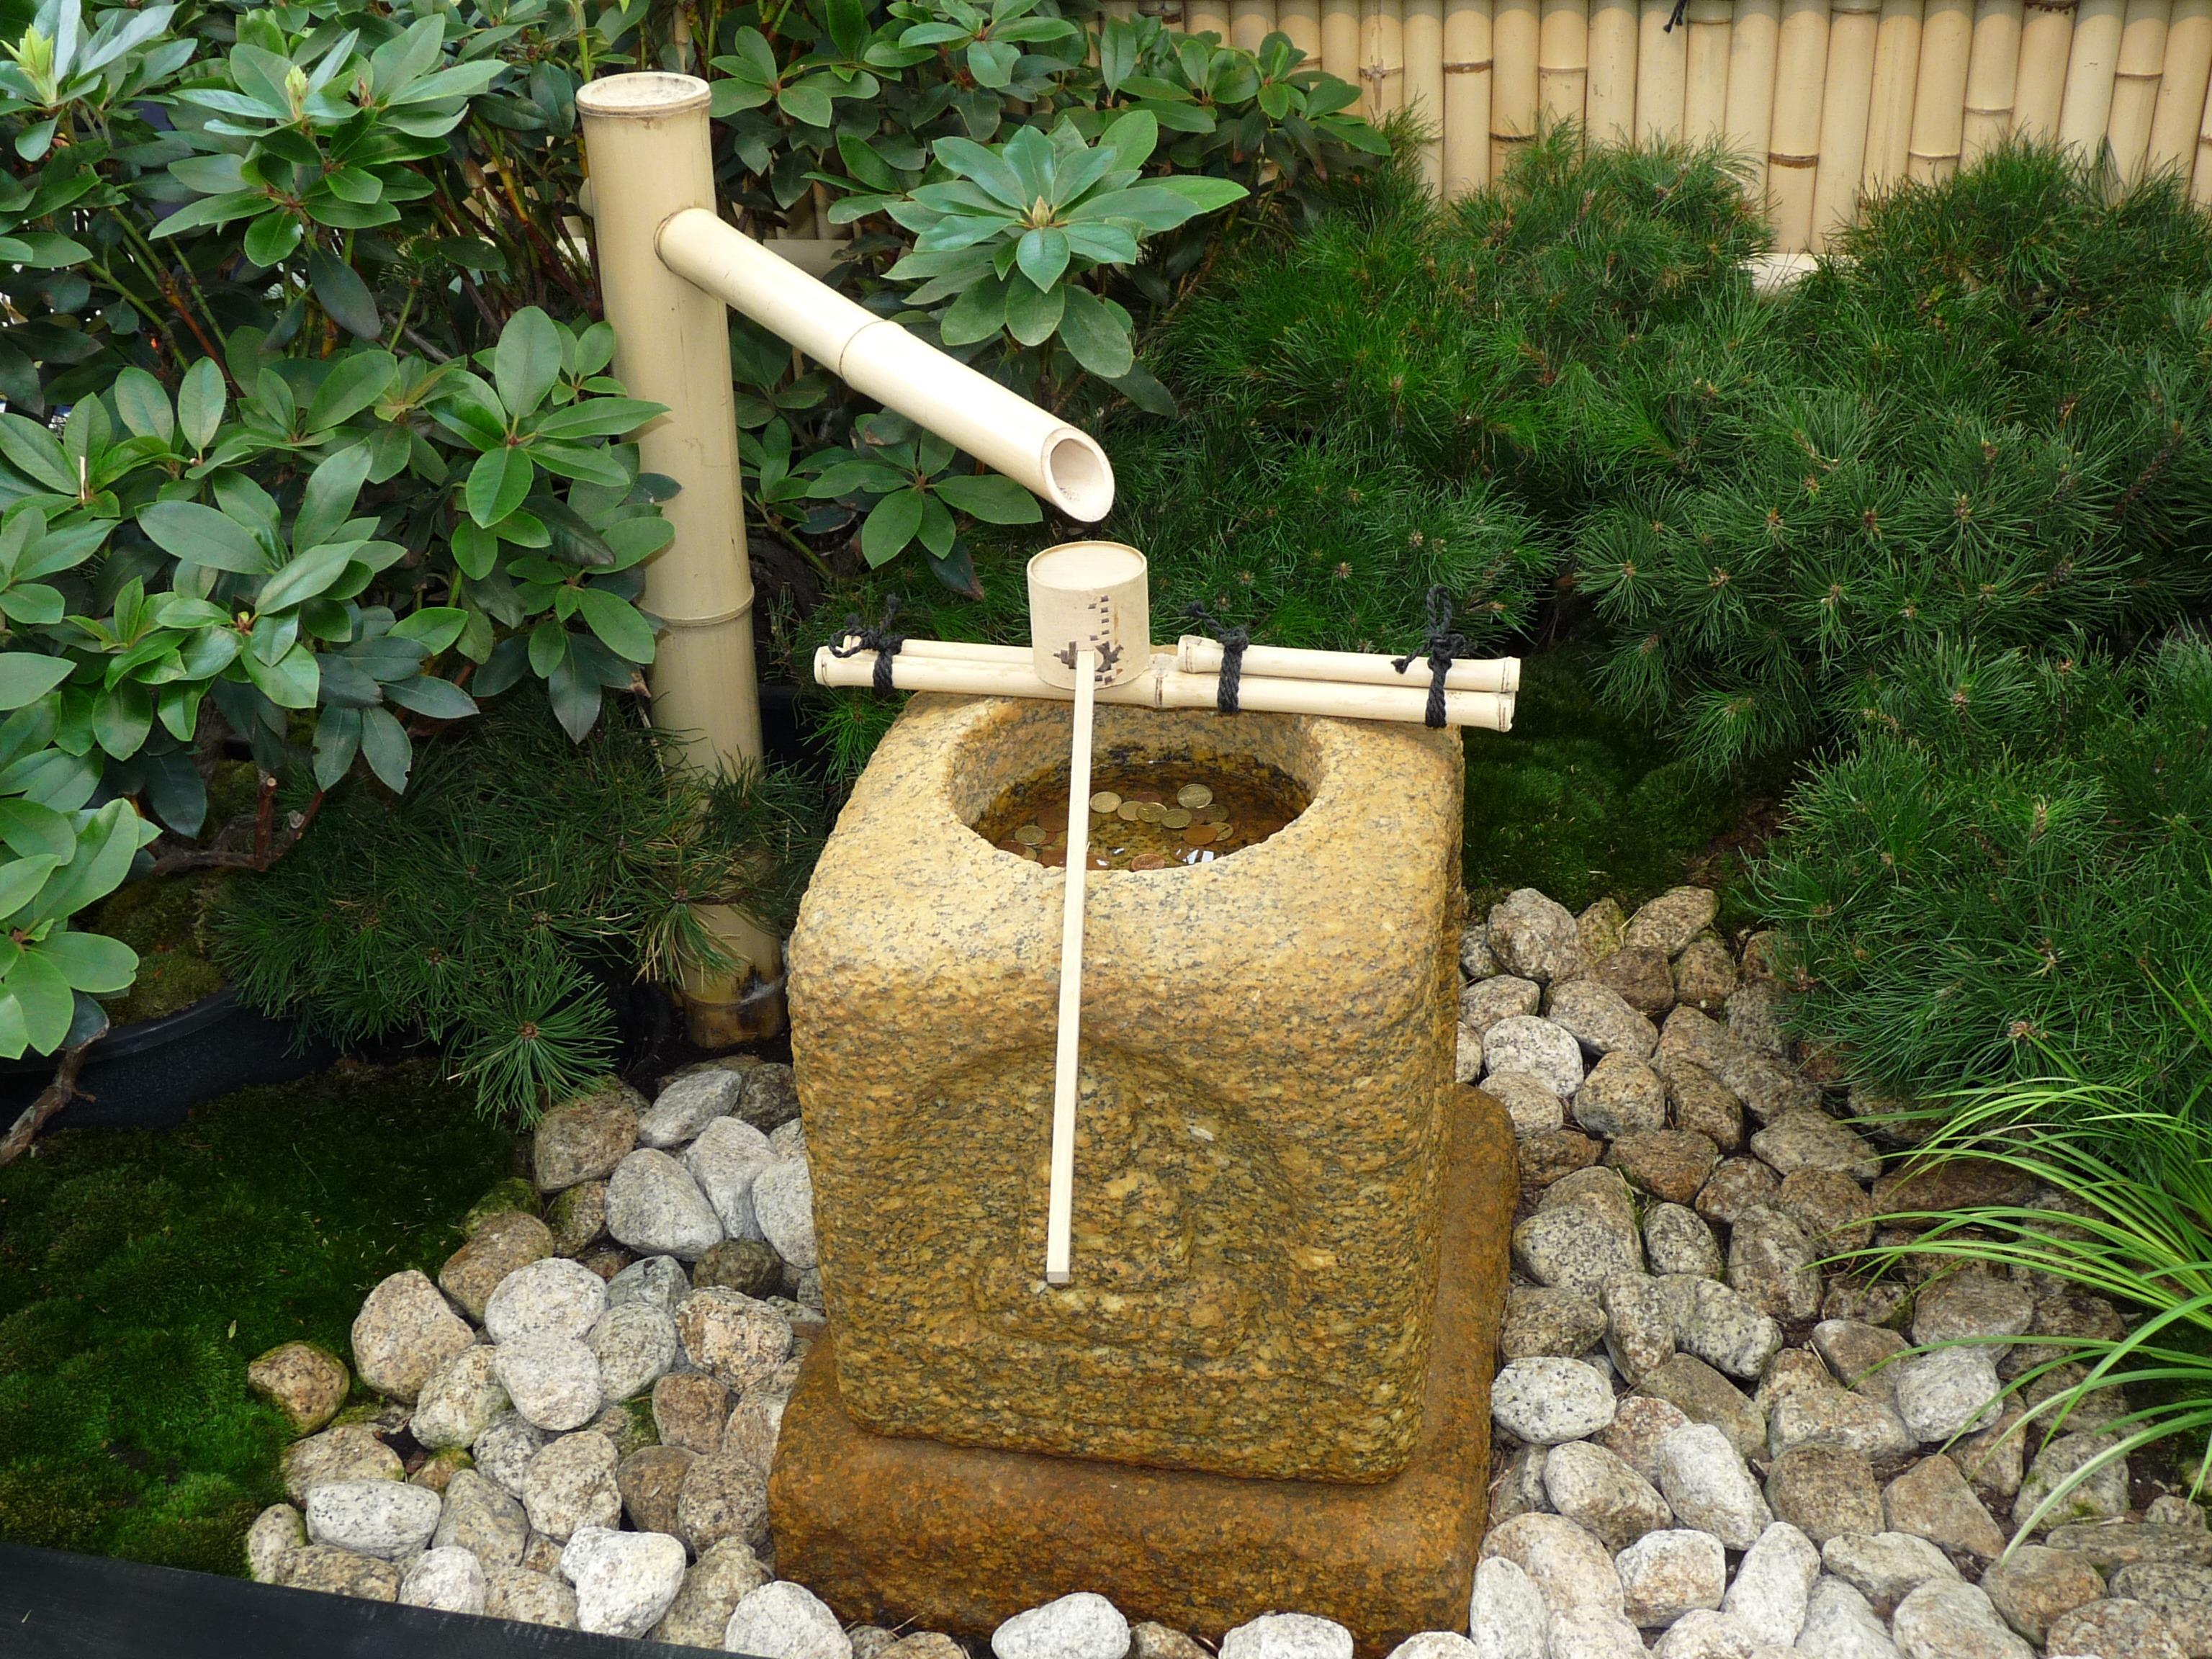 Beau Water Lawn Tube Decoration Money Backyard Soil Garden Water Fountain Stones  Fountain Flowerpot Yard Bamboo Water